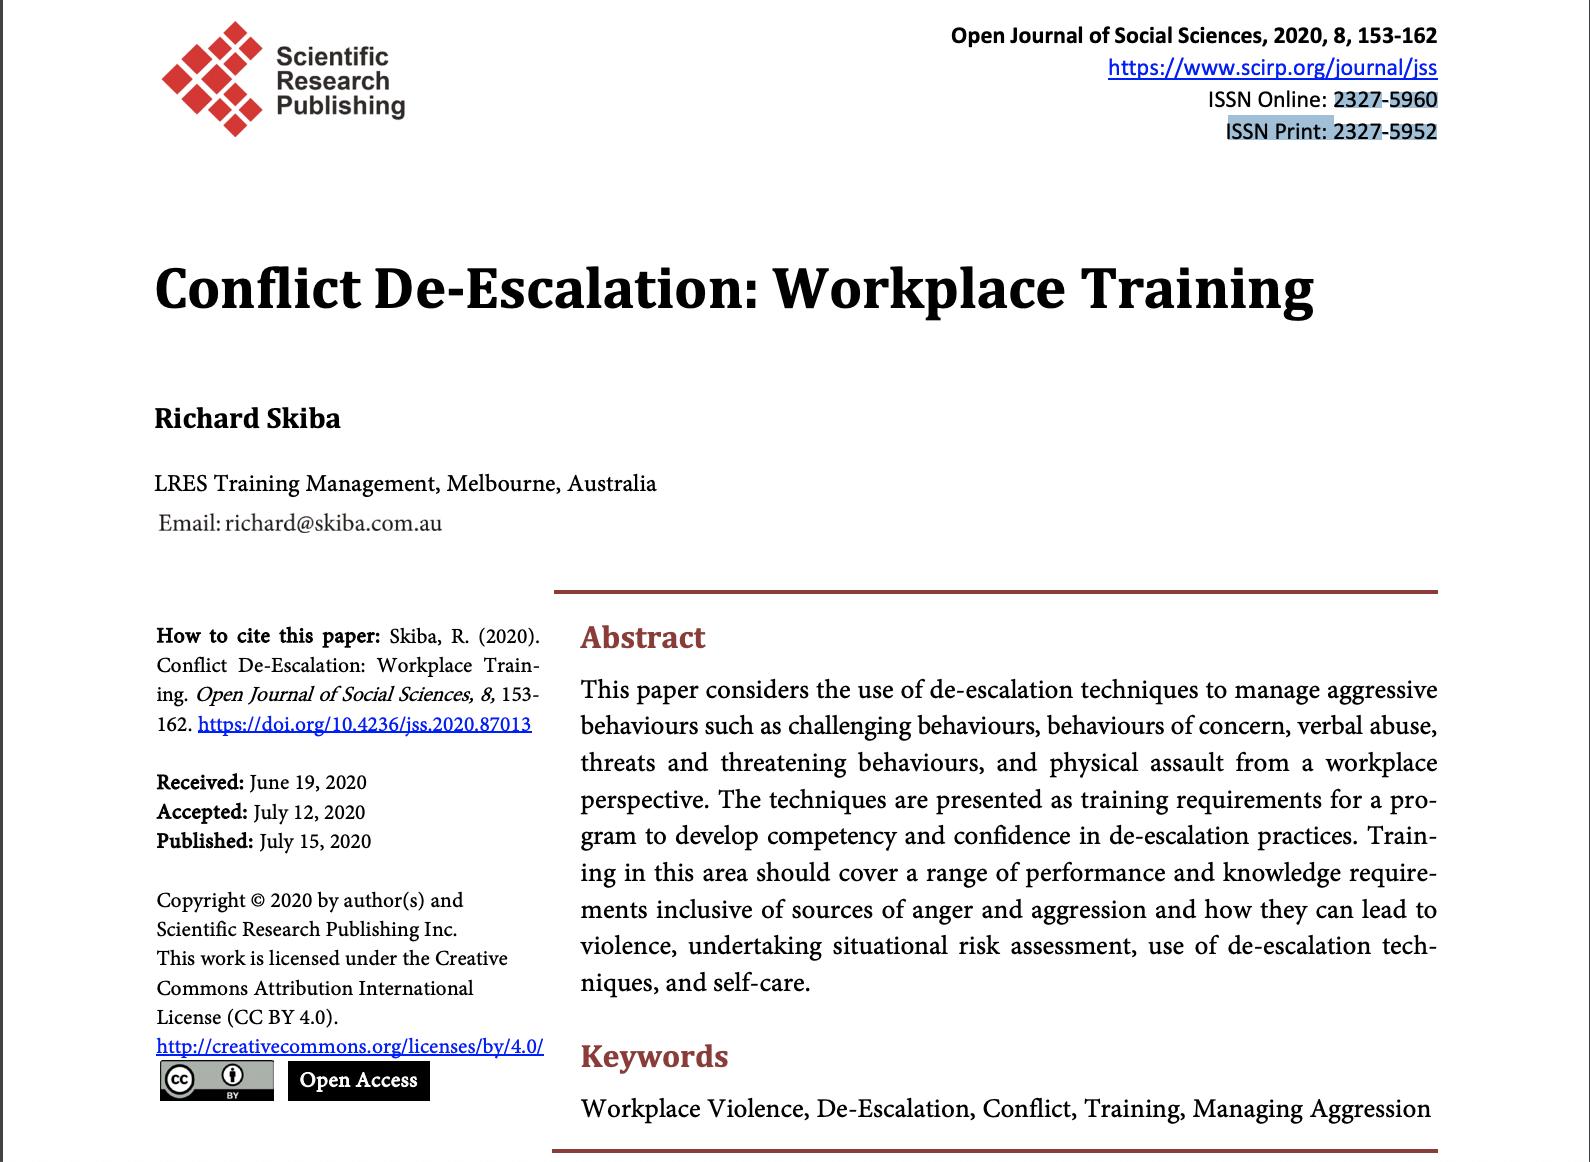 Conflict De-Escalation: Workplace Training